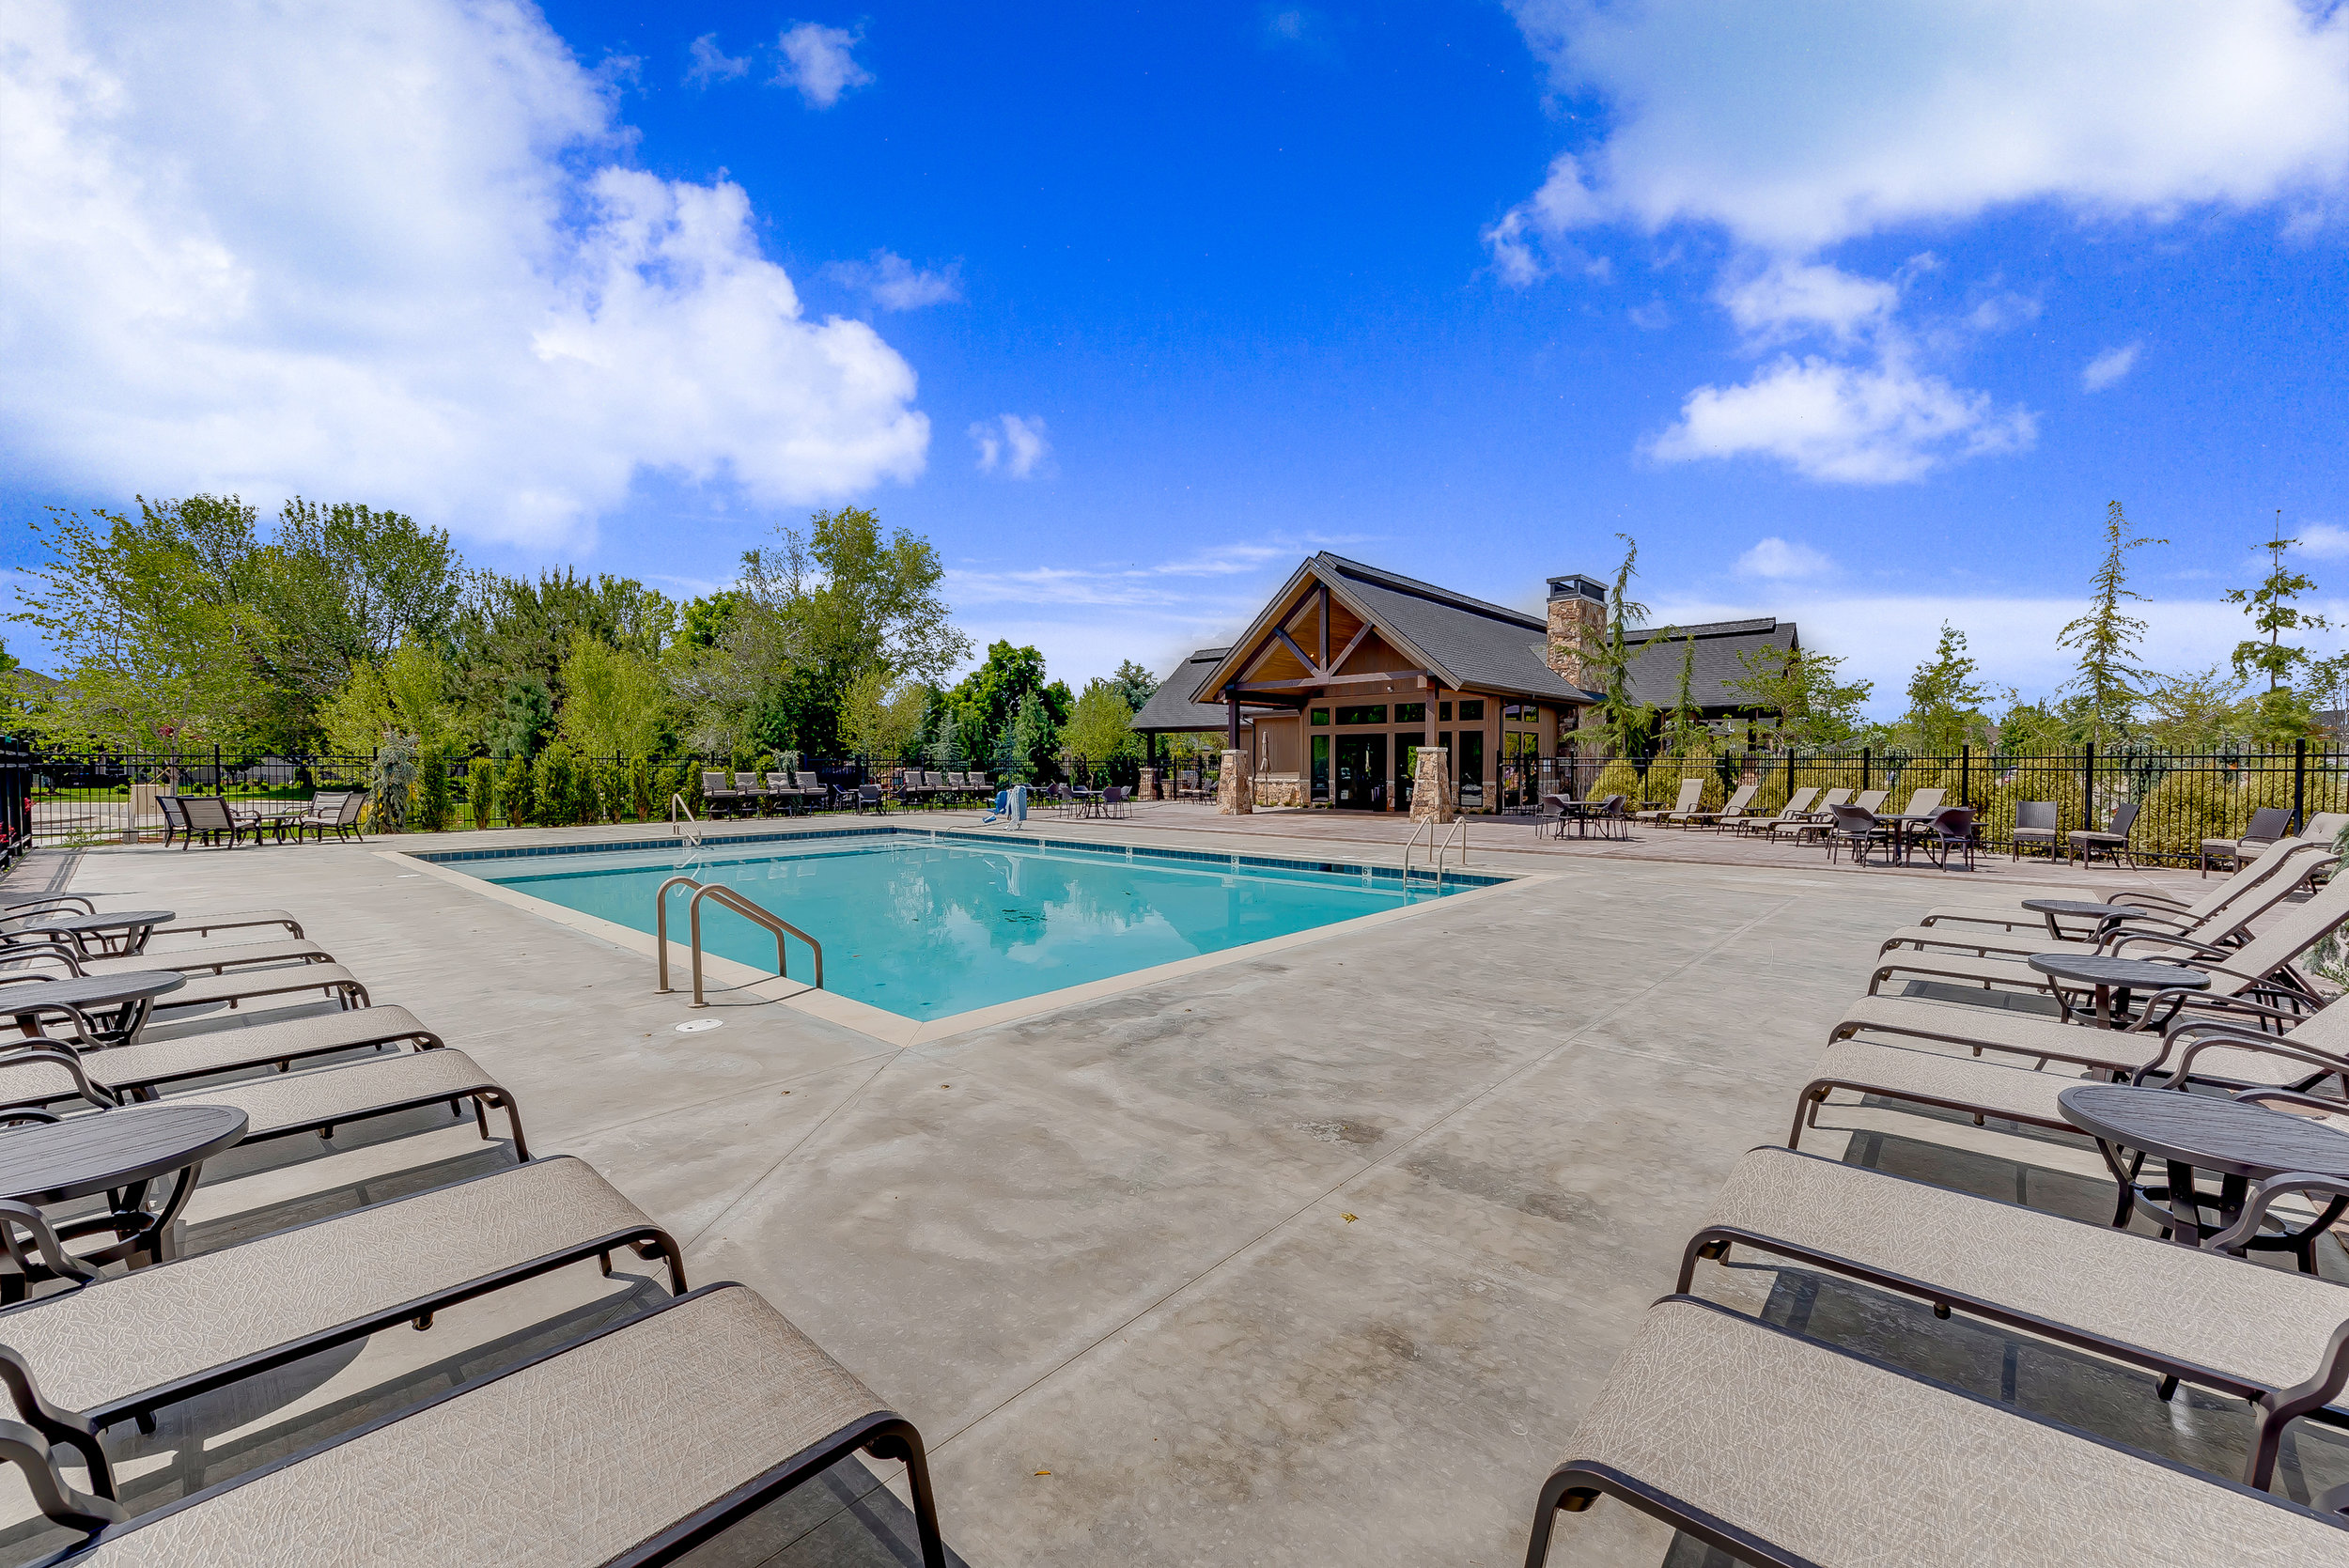 16-Williamson River Ranch Pool.jpg